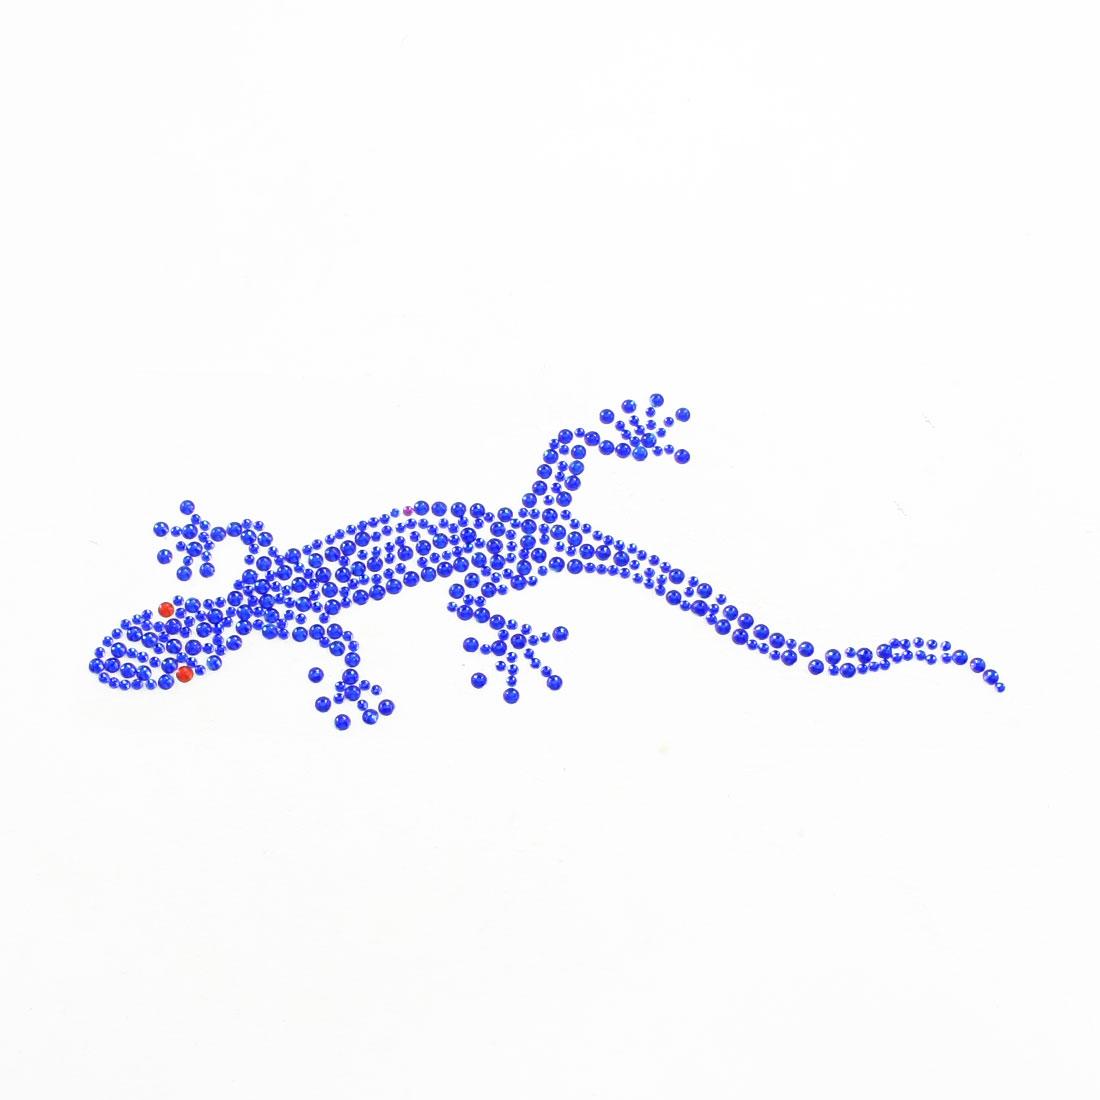 Bling Royal Blue Plastic Rhinestone Decor Wall Gecko Design 3D Sticker for Car